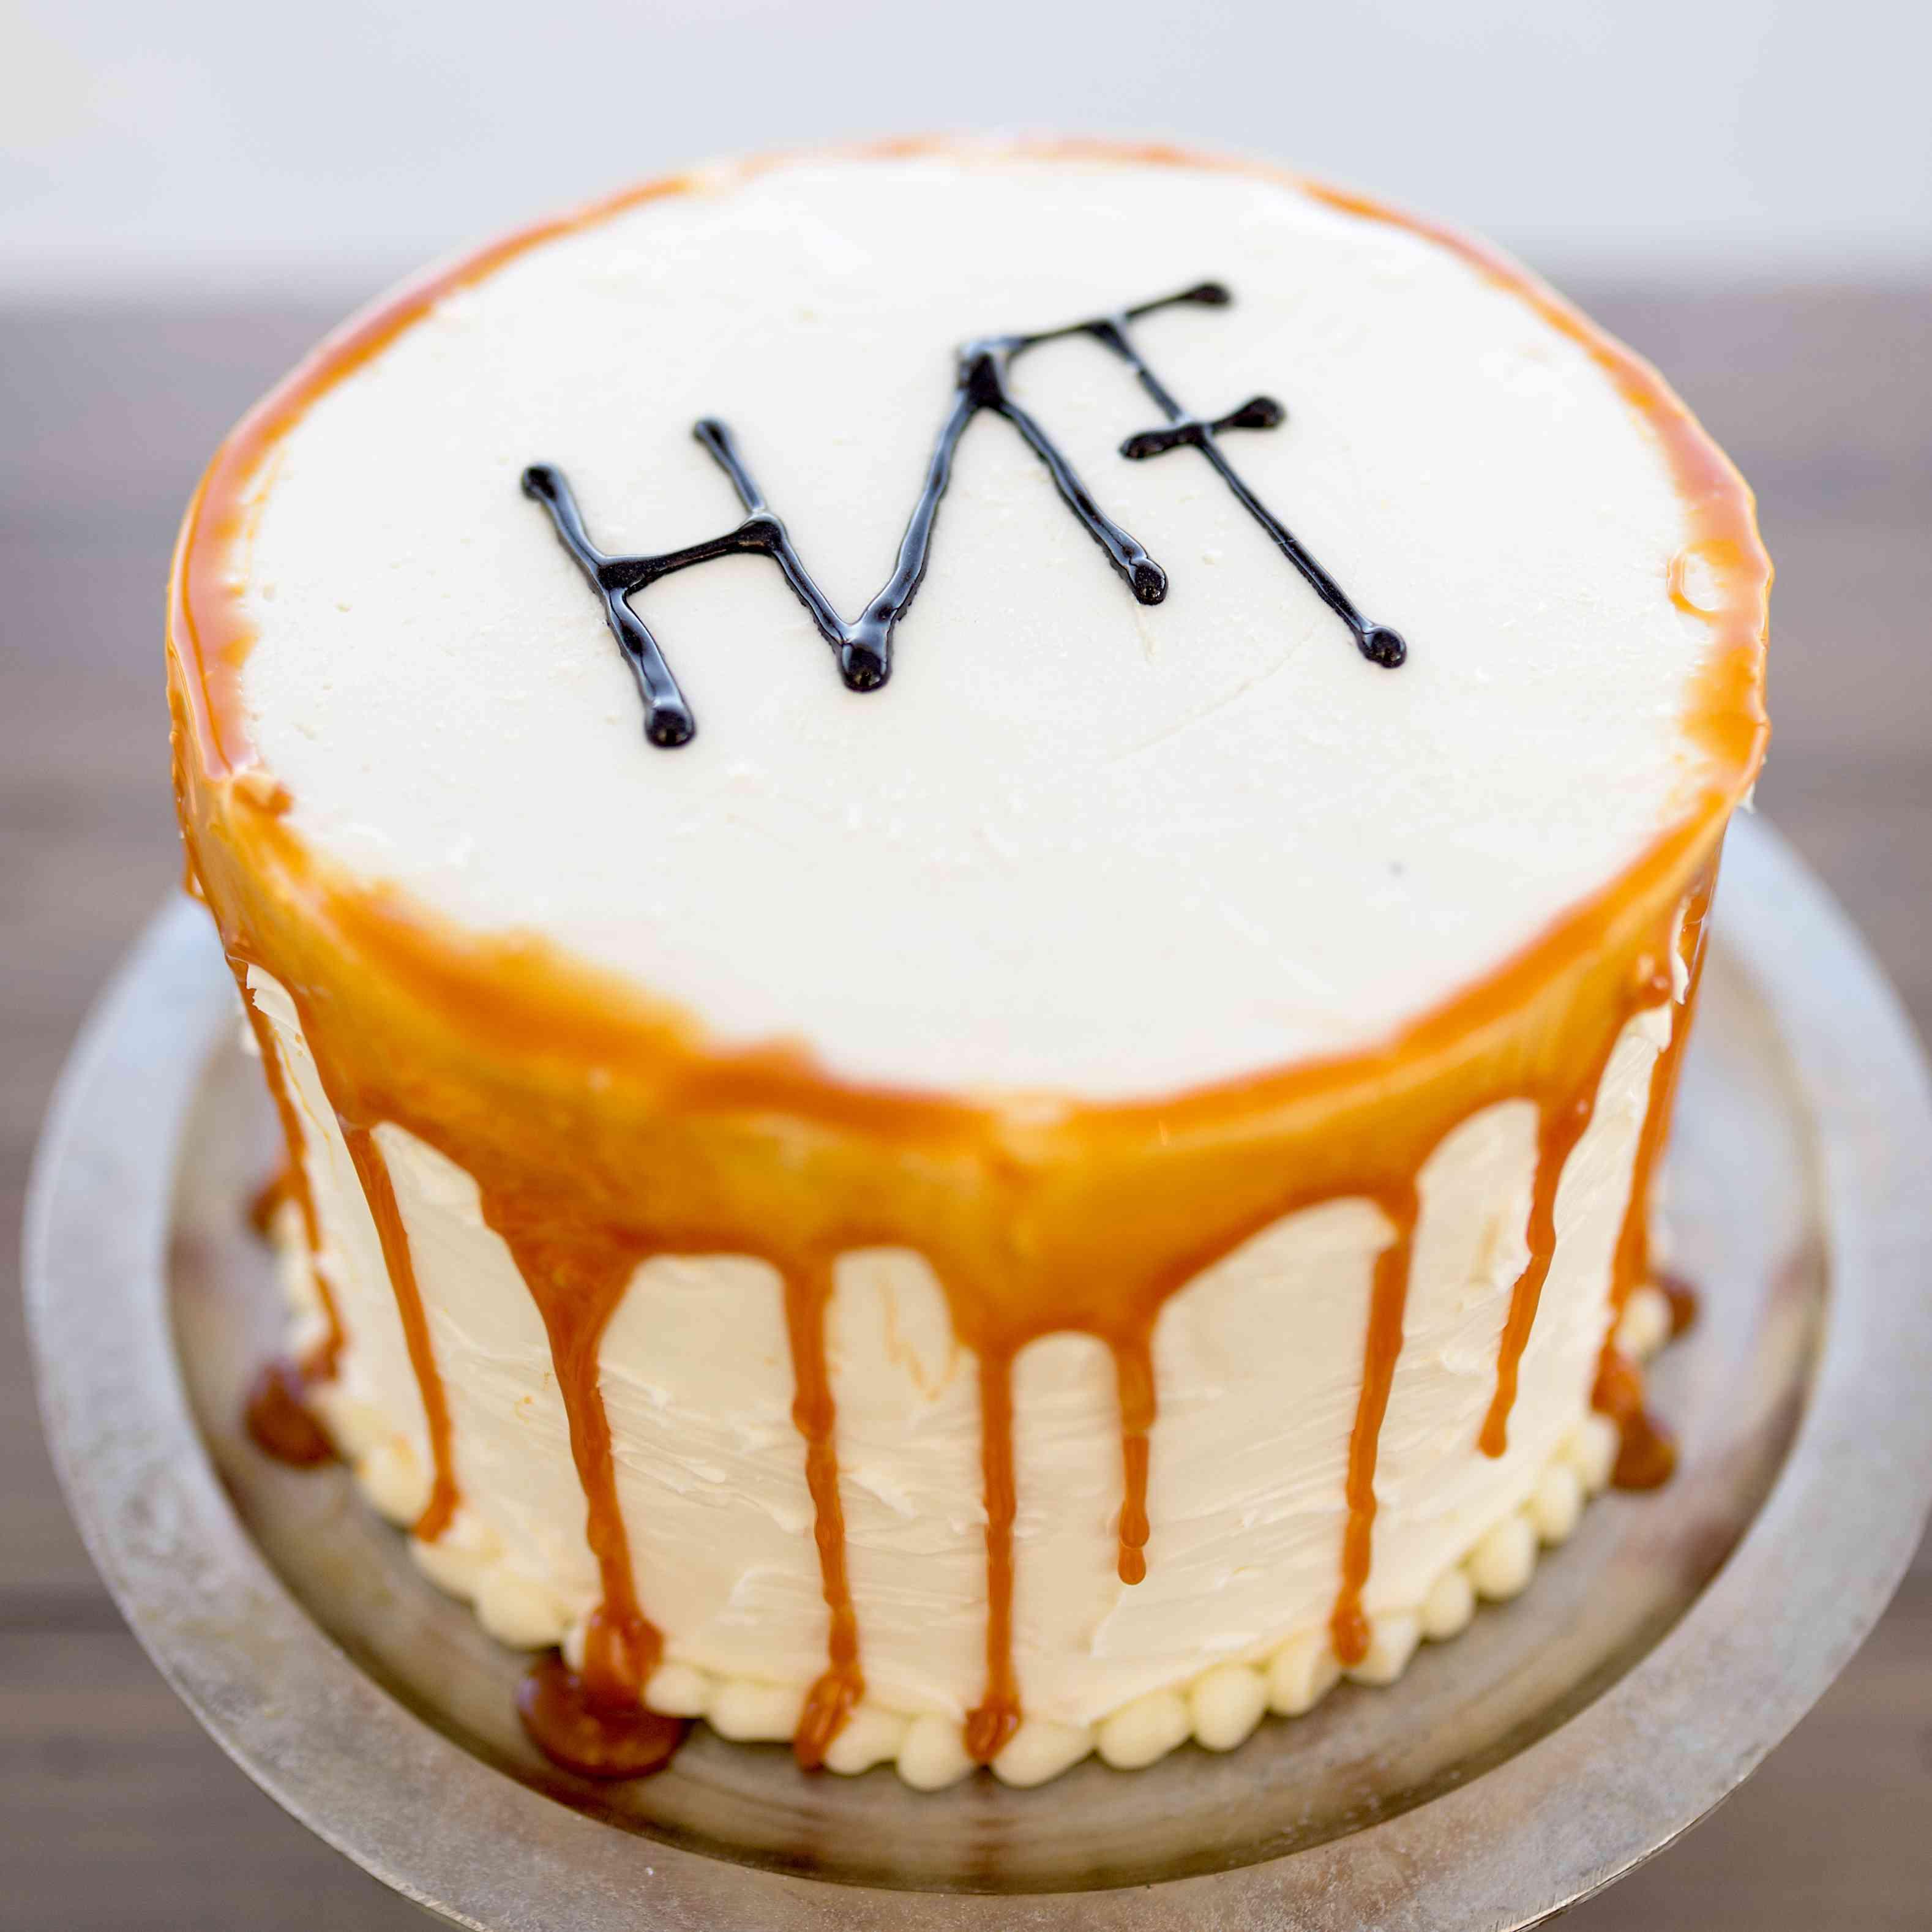 Second wedding cake